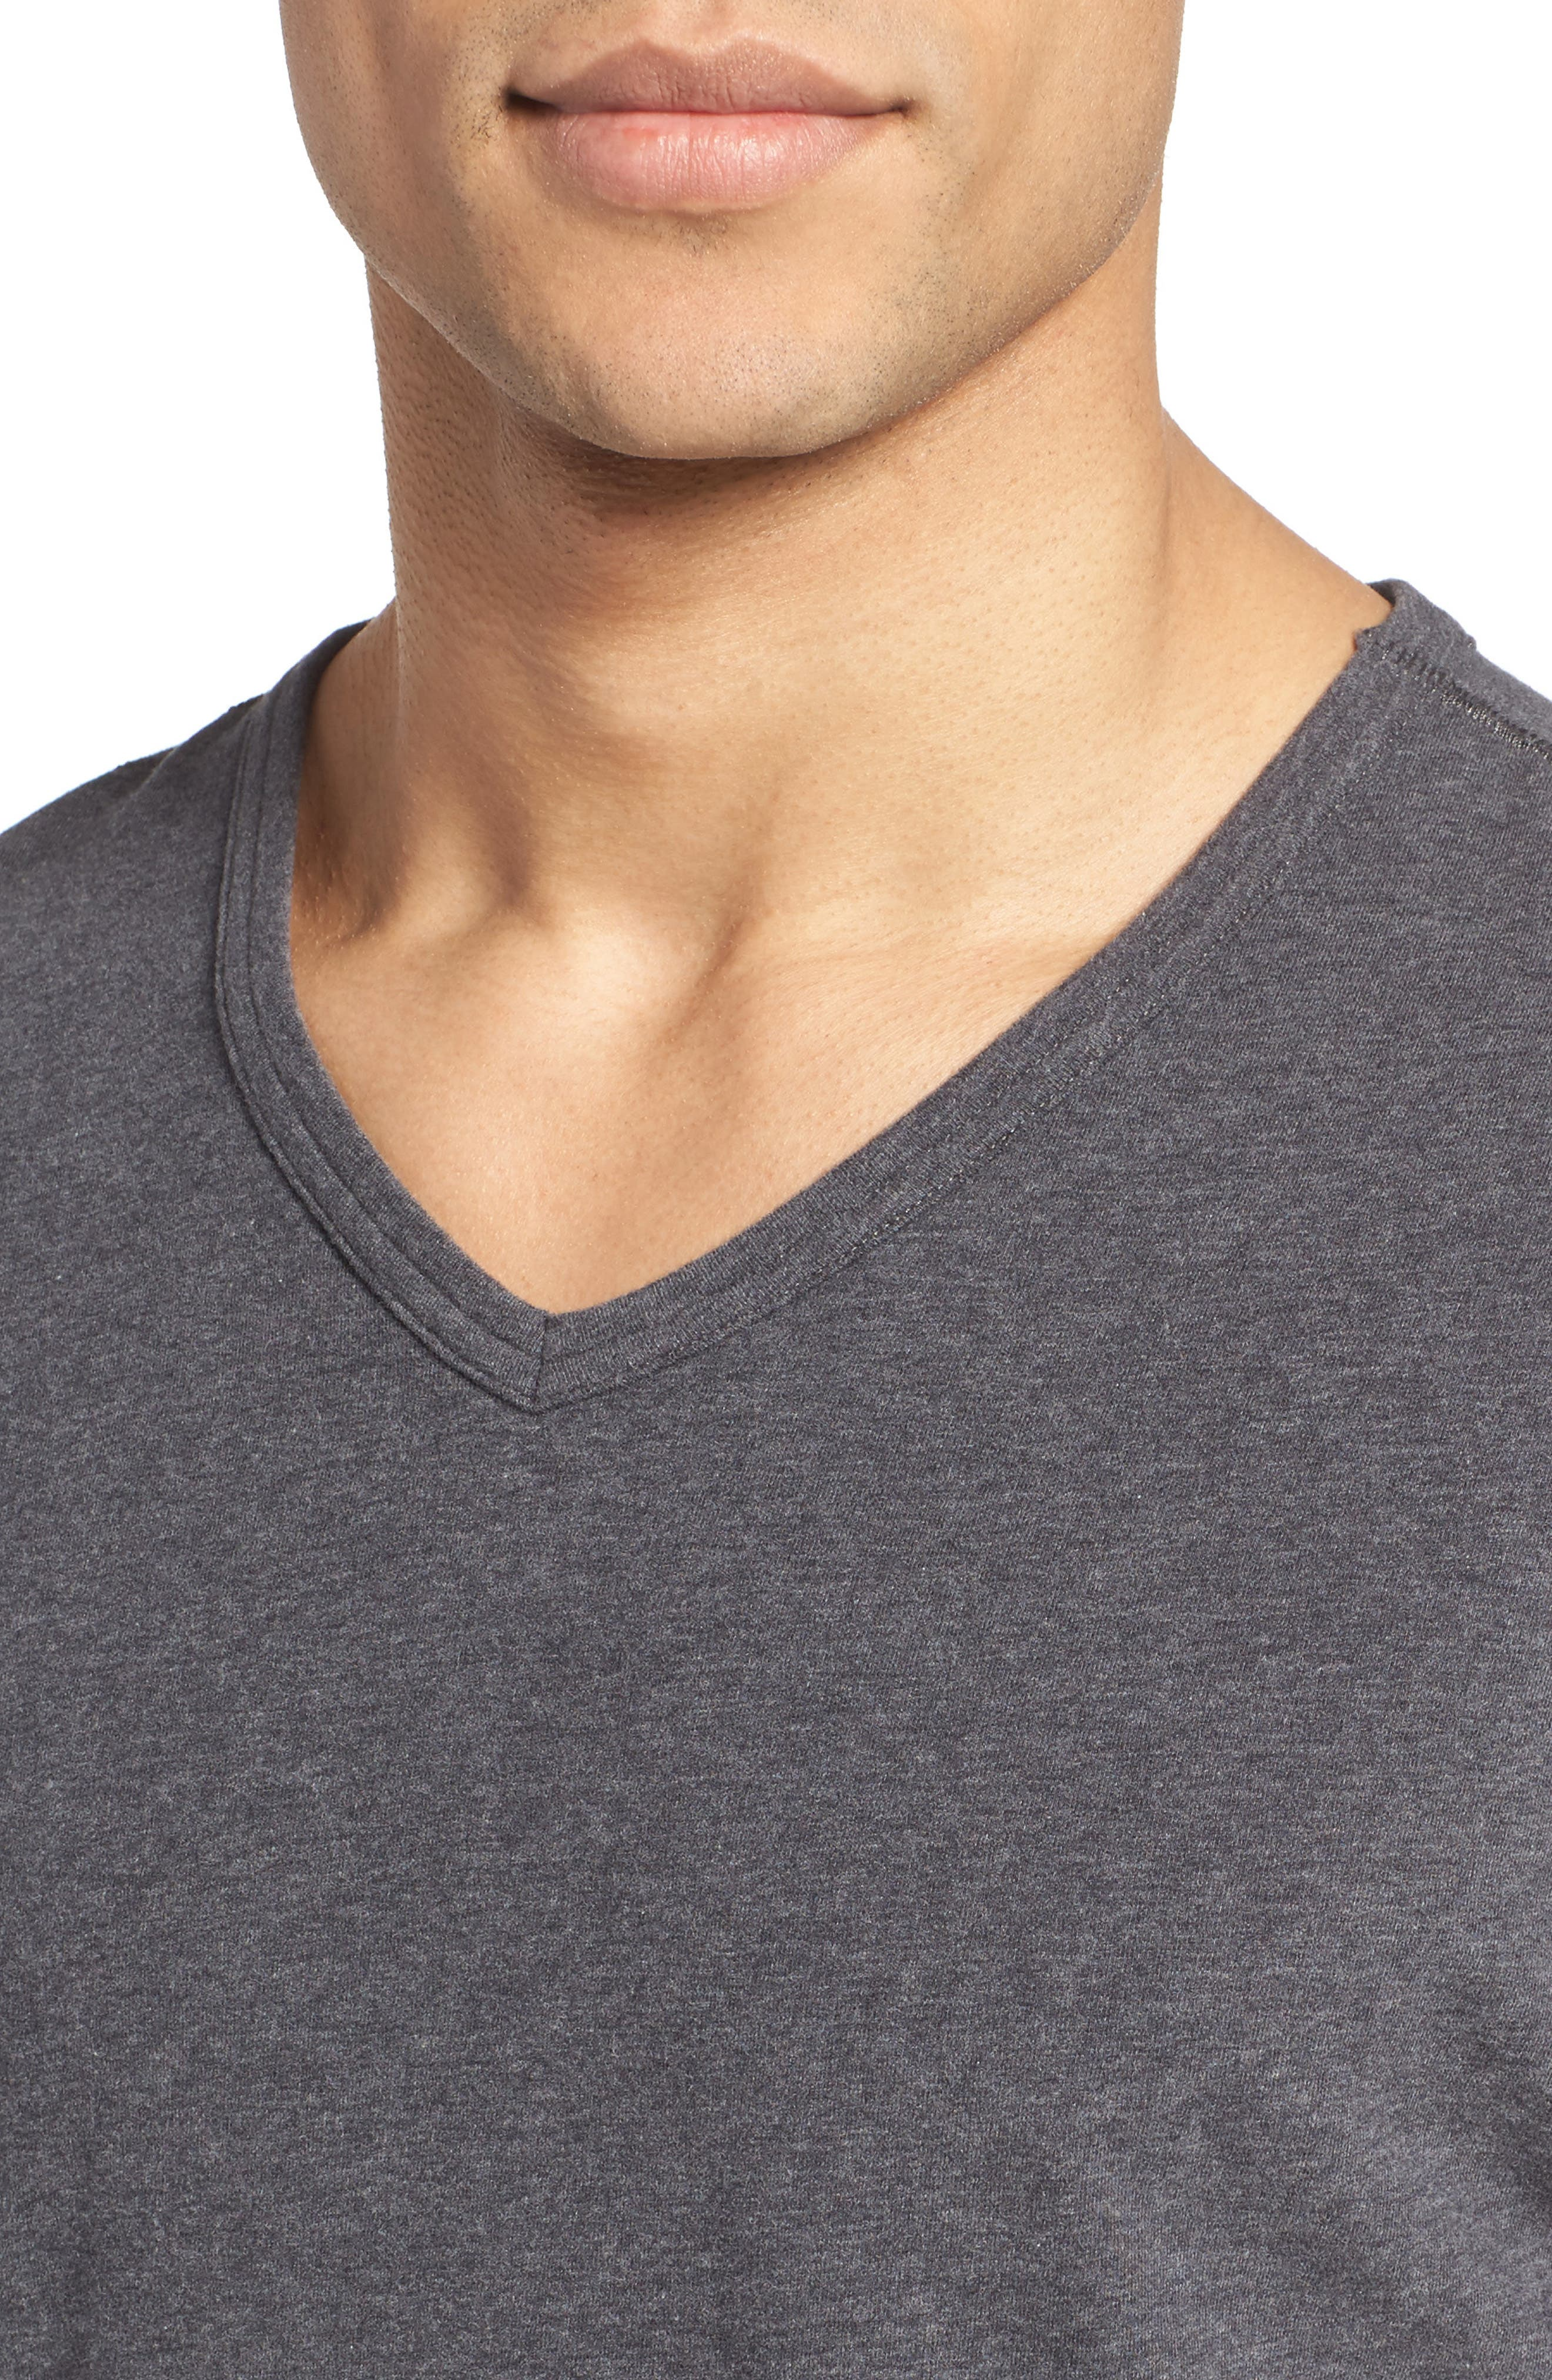 Stretch Cotton V-Neck T-Shirt,                             Alternate thumbnail 4, color,                             020